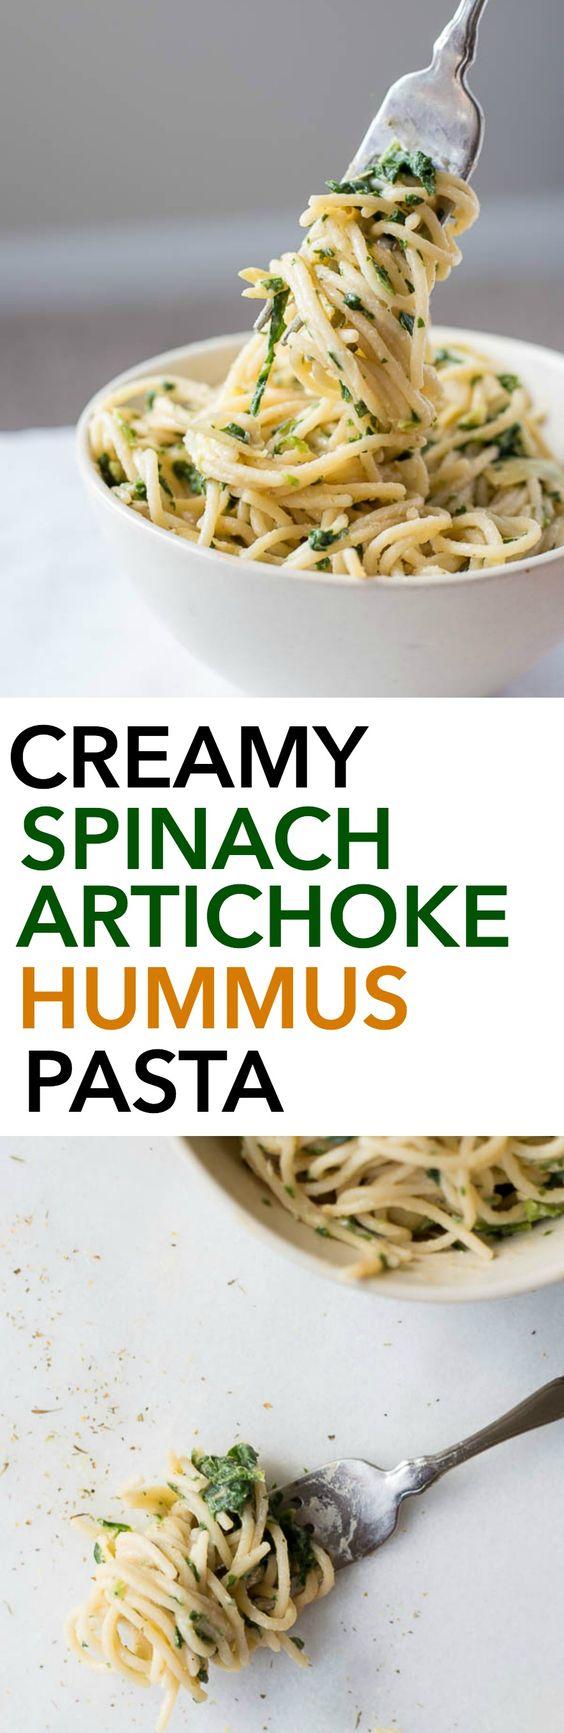 Spinach Artichoke Hummus Pasta: A healthy, gluten free, and vegan ...